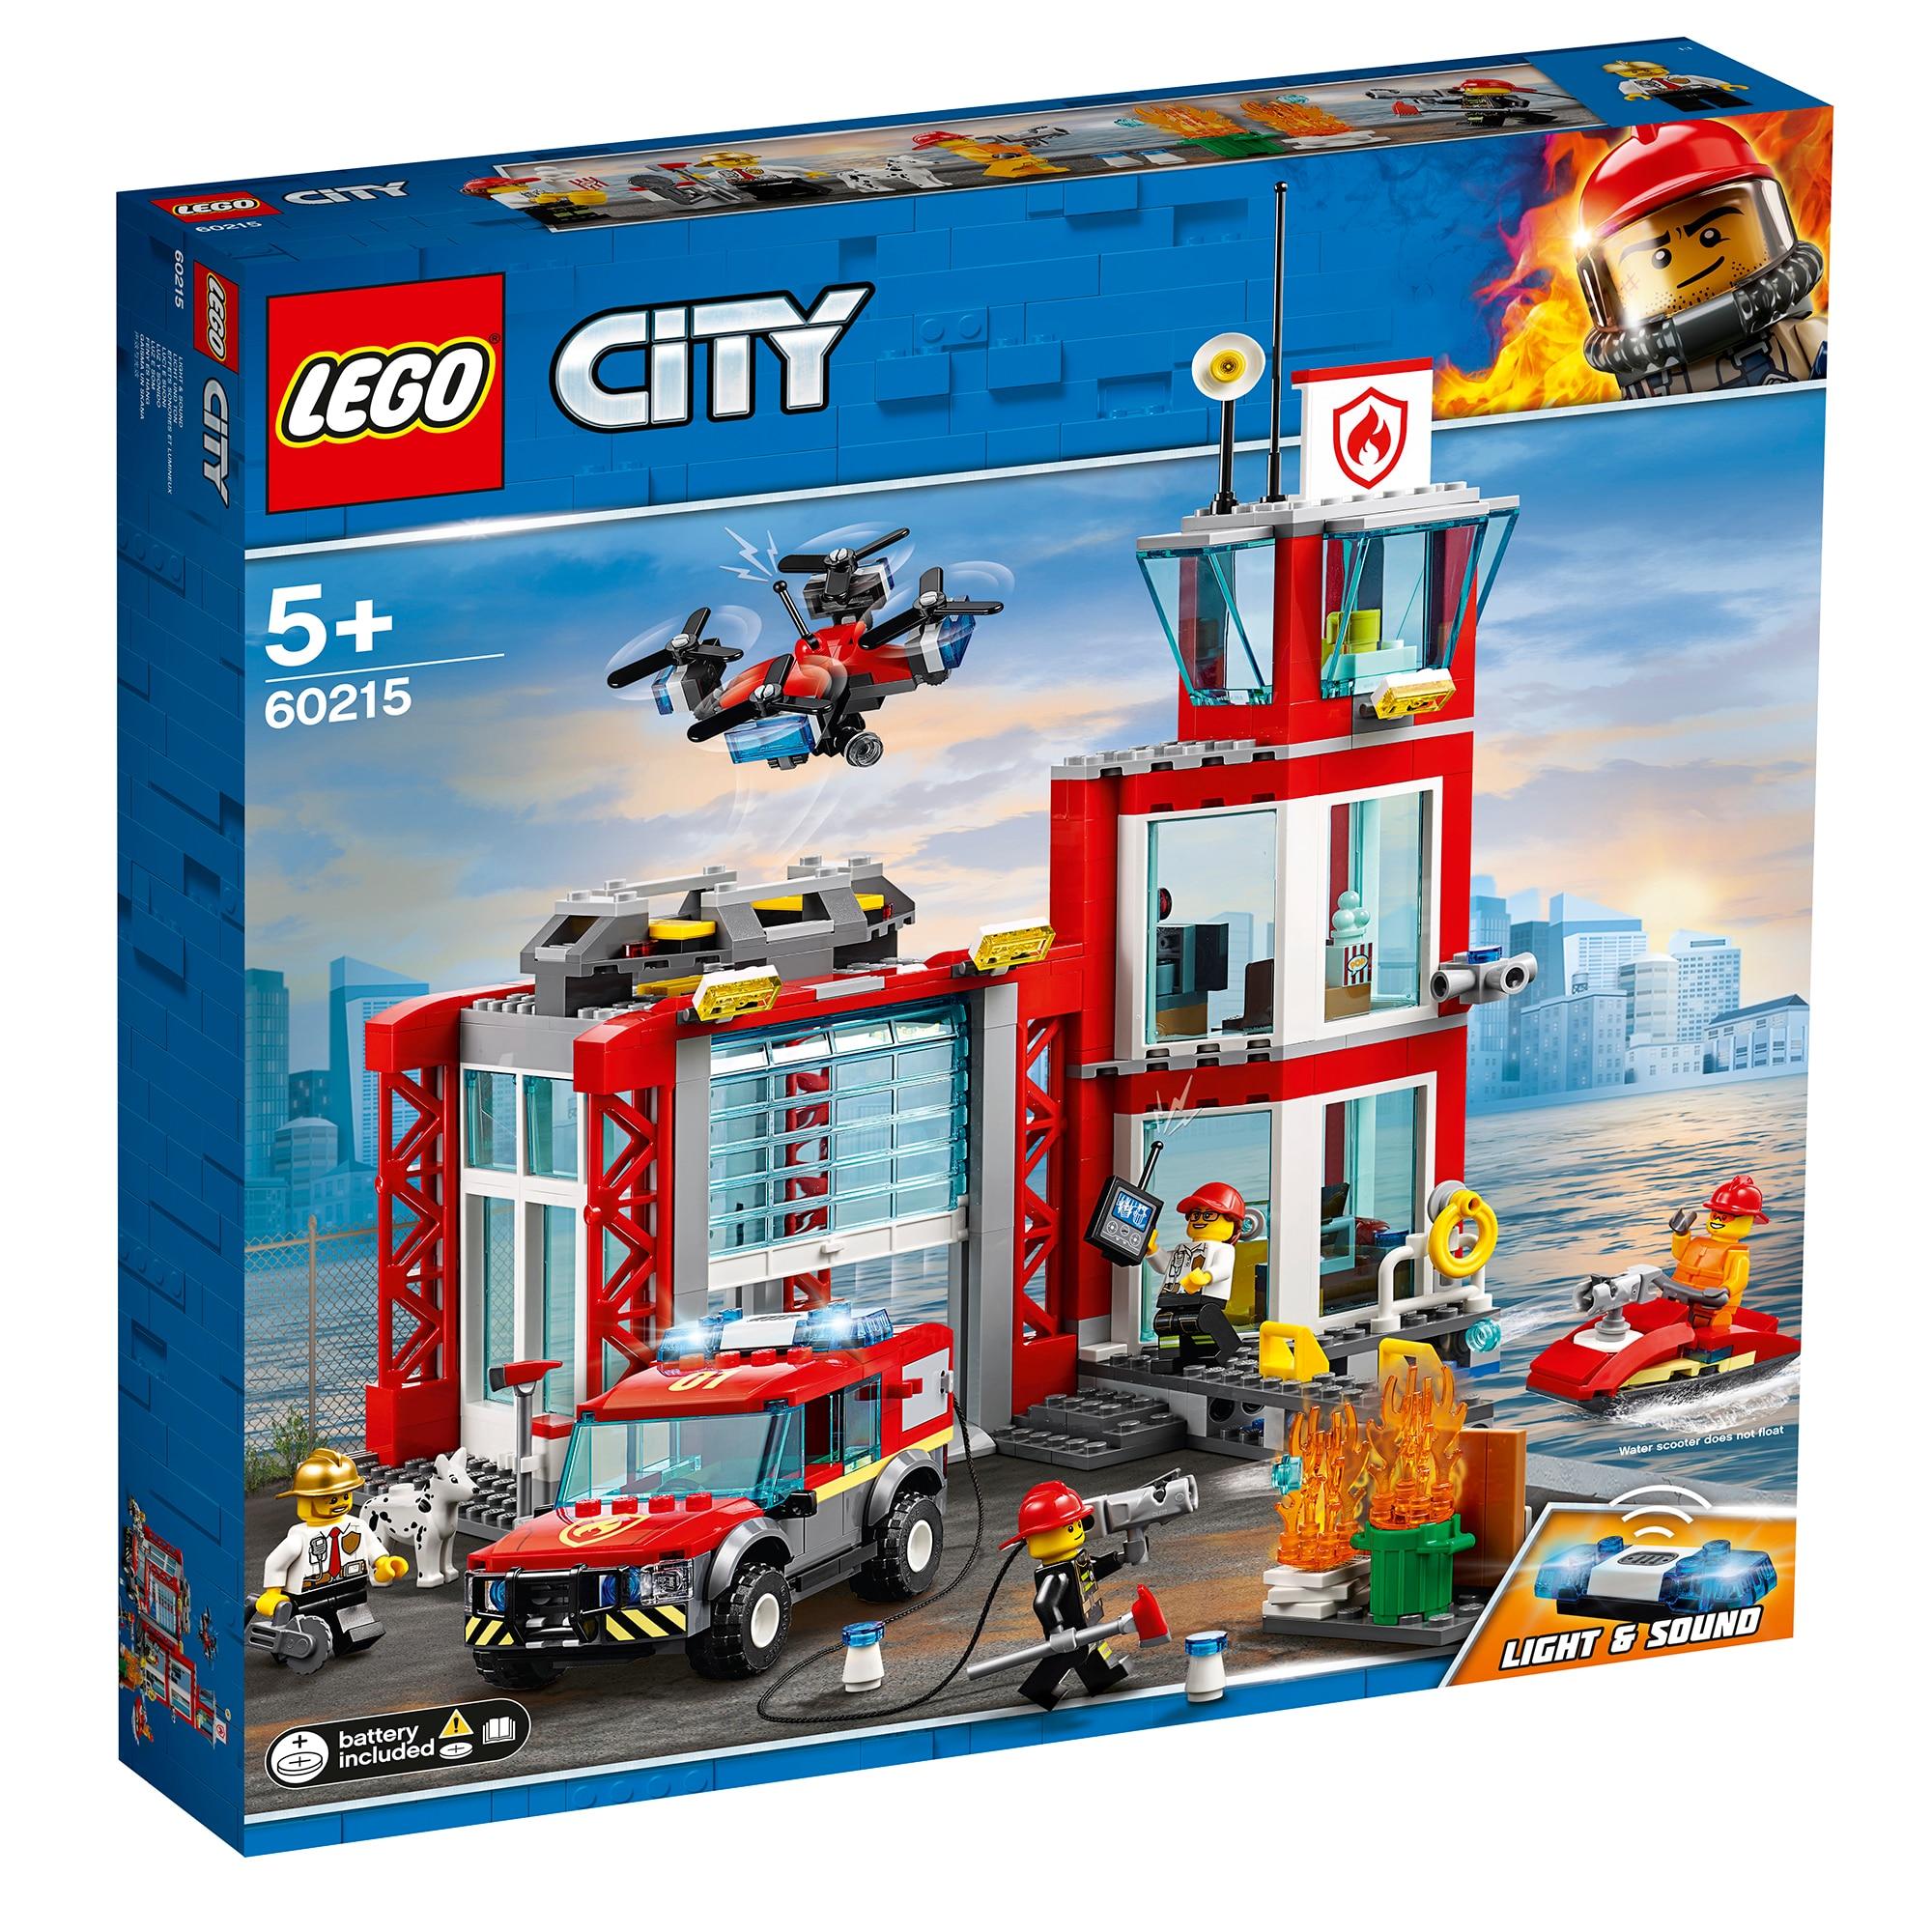 Fotografie LEGO City Fire - Statie de pompieri 60215, 508 piese